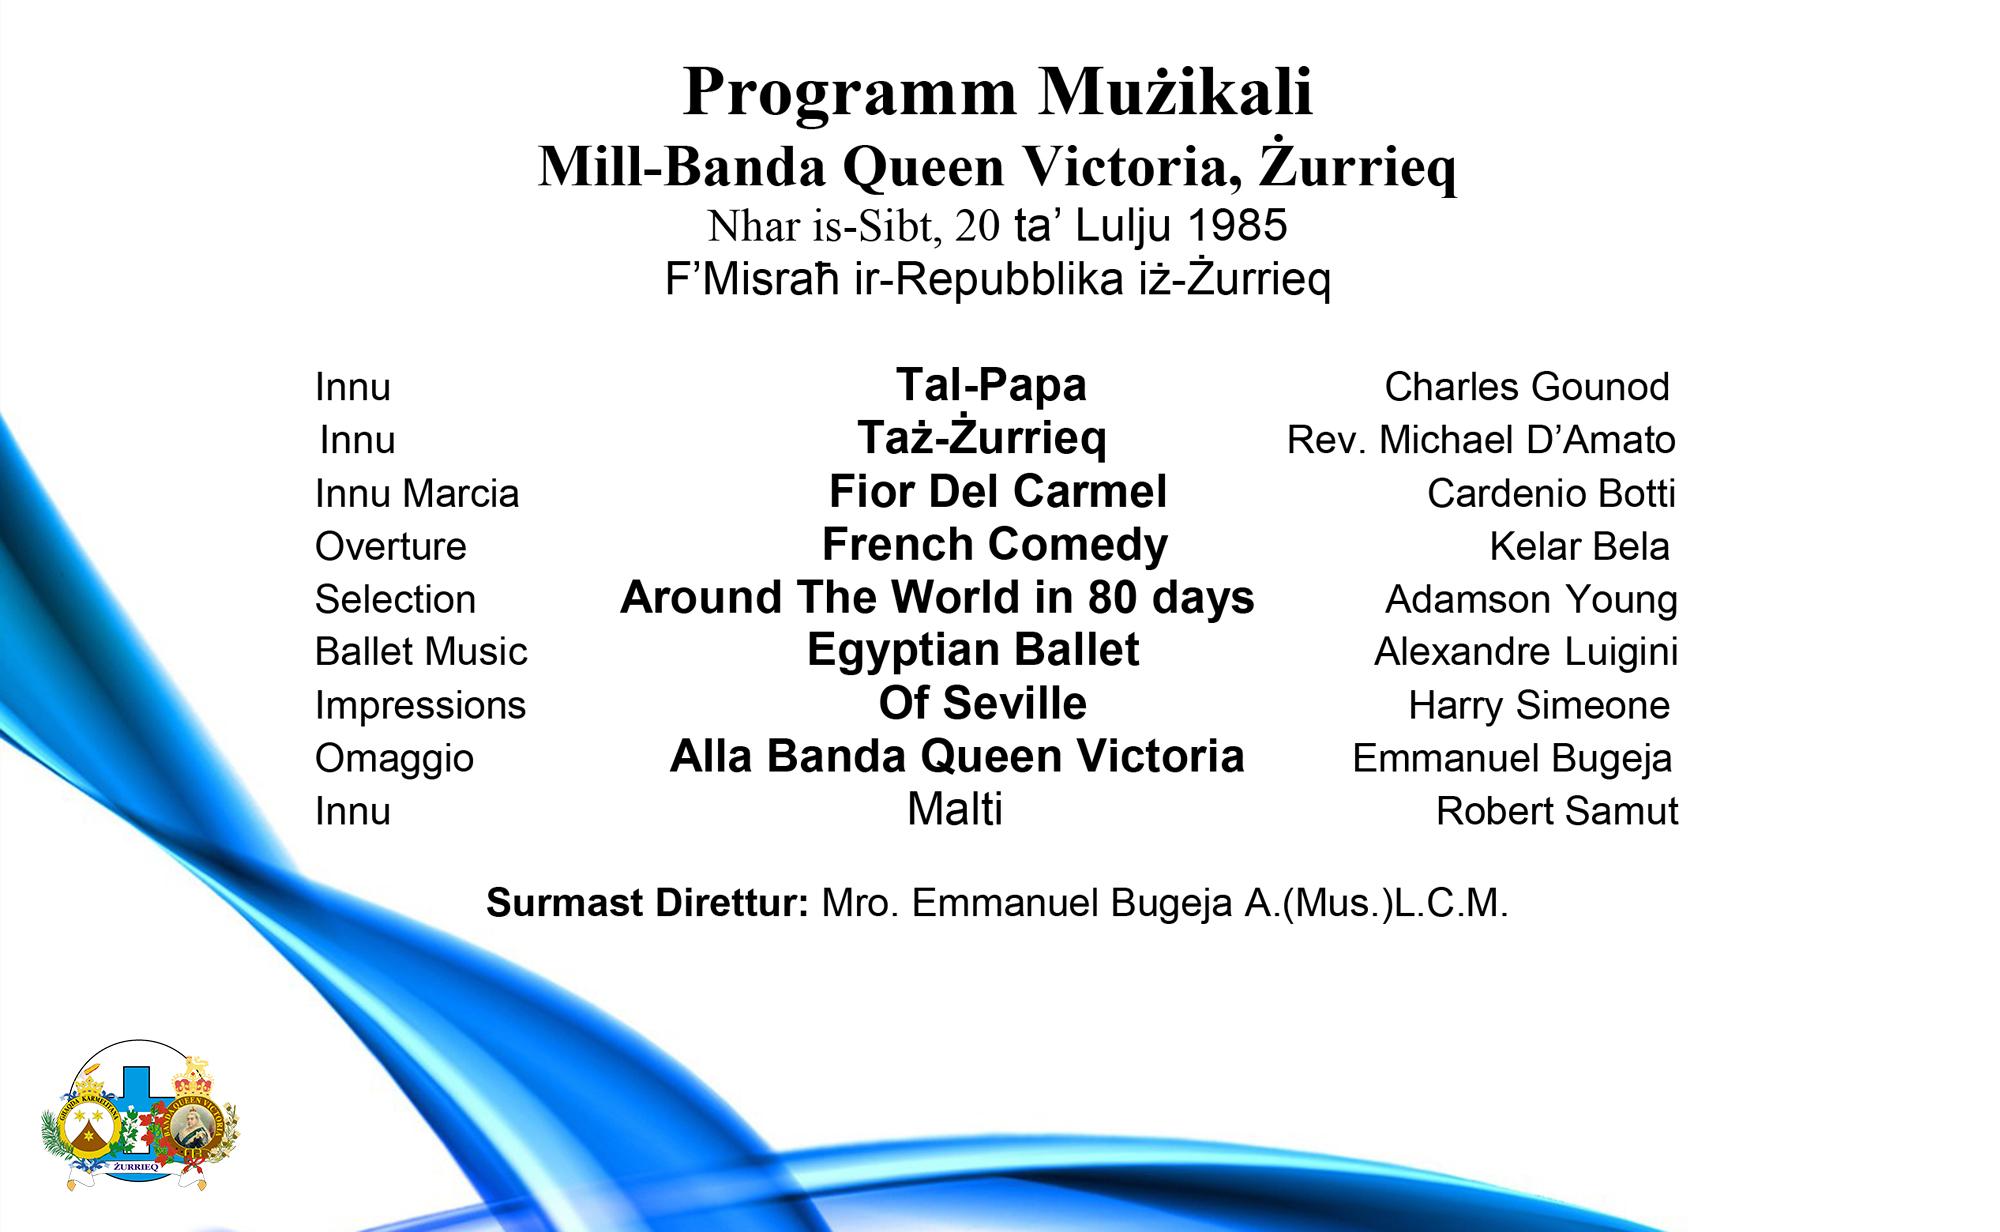 1985 Programm Strumentali